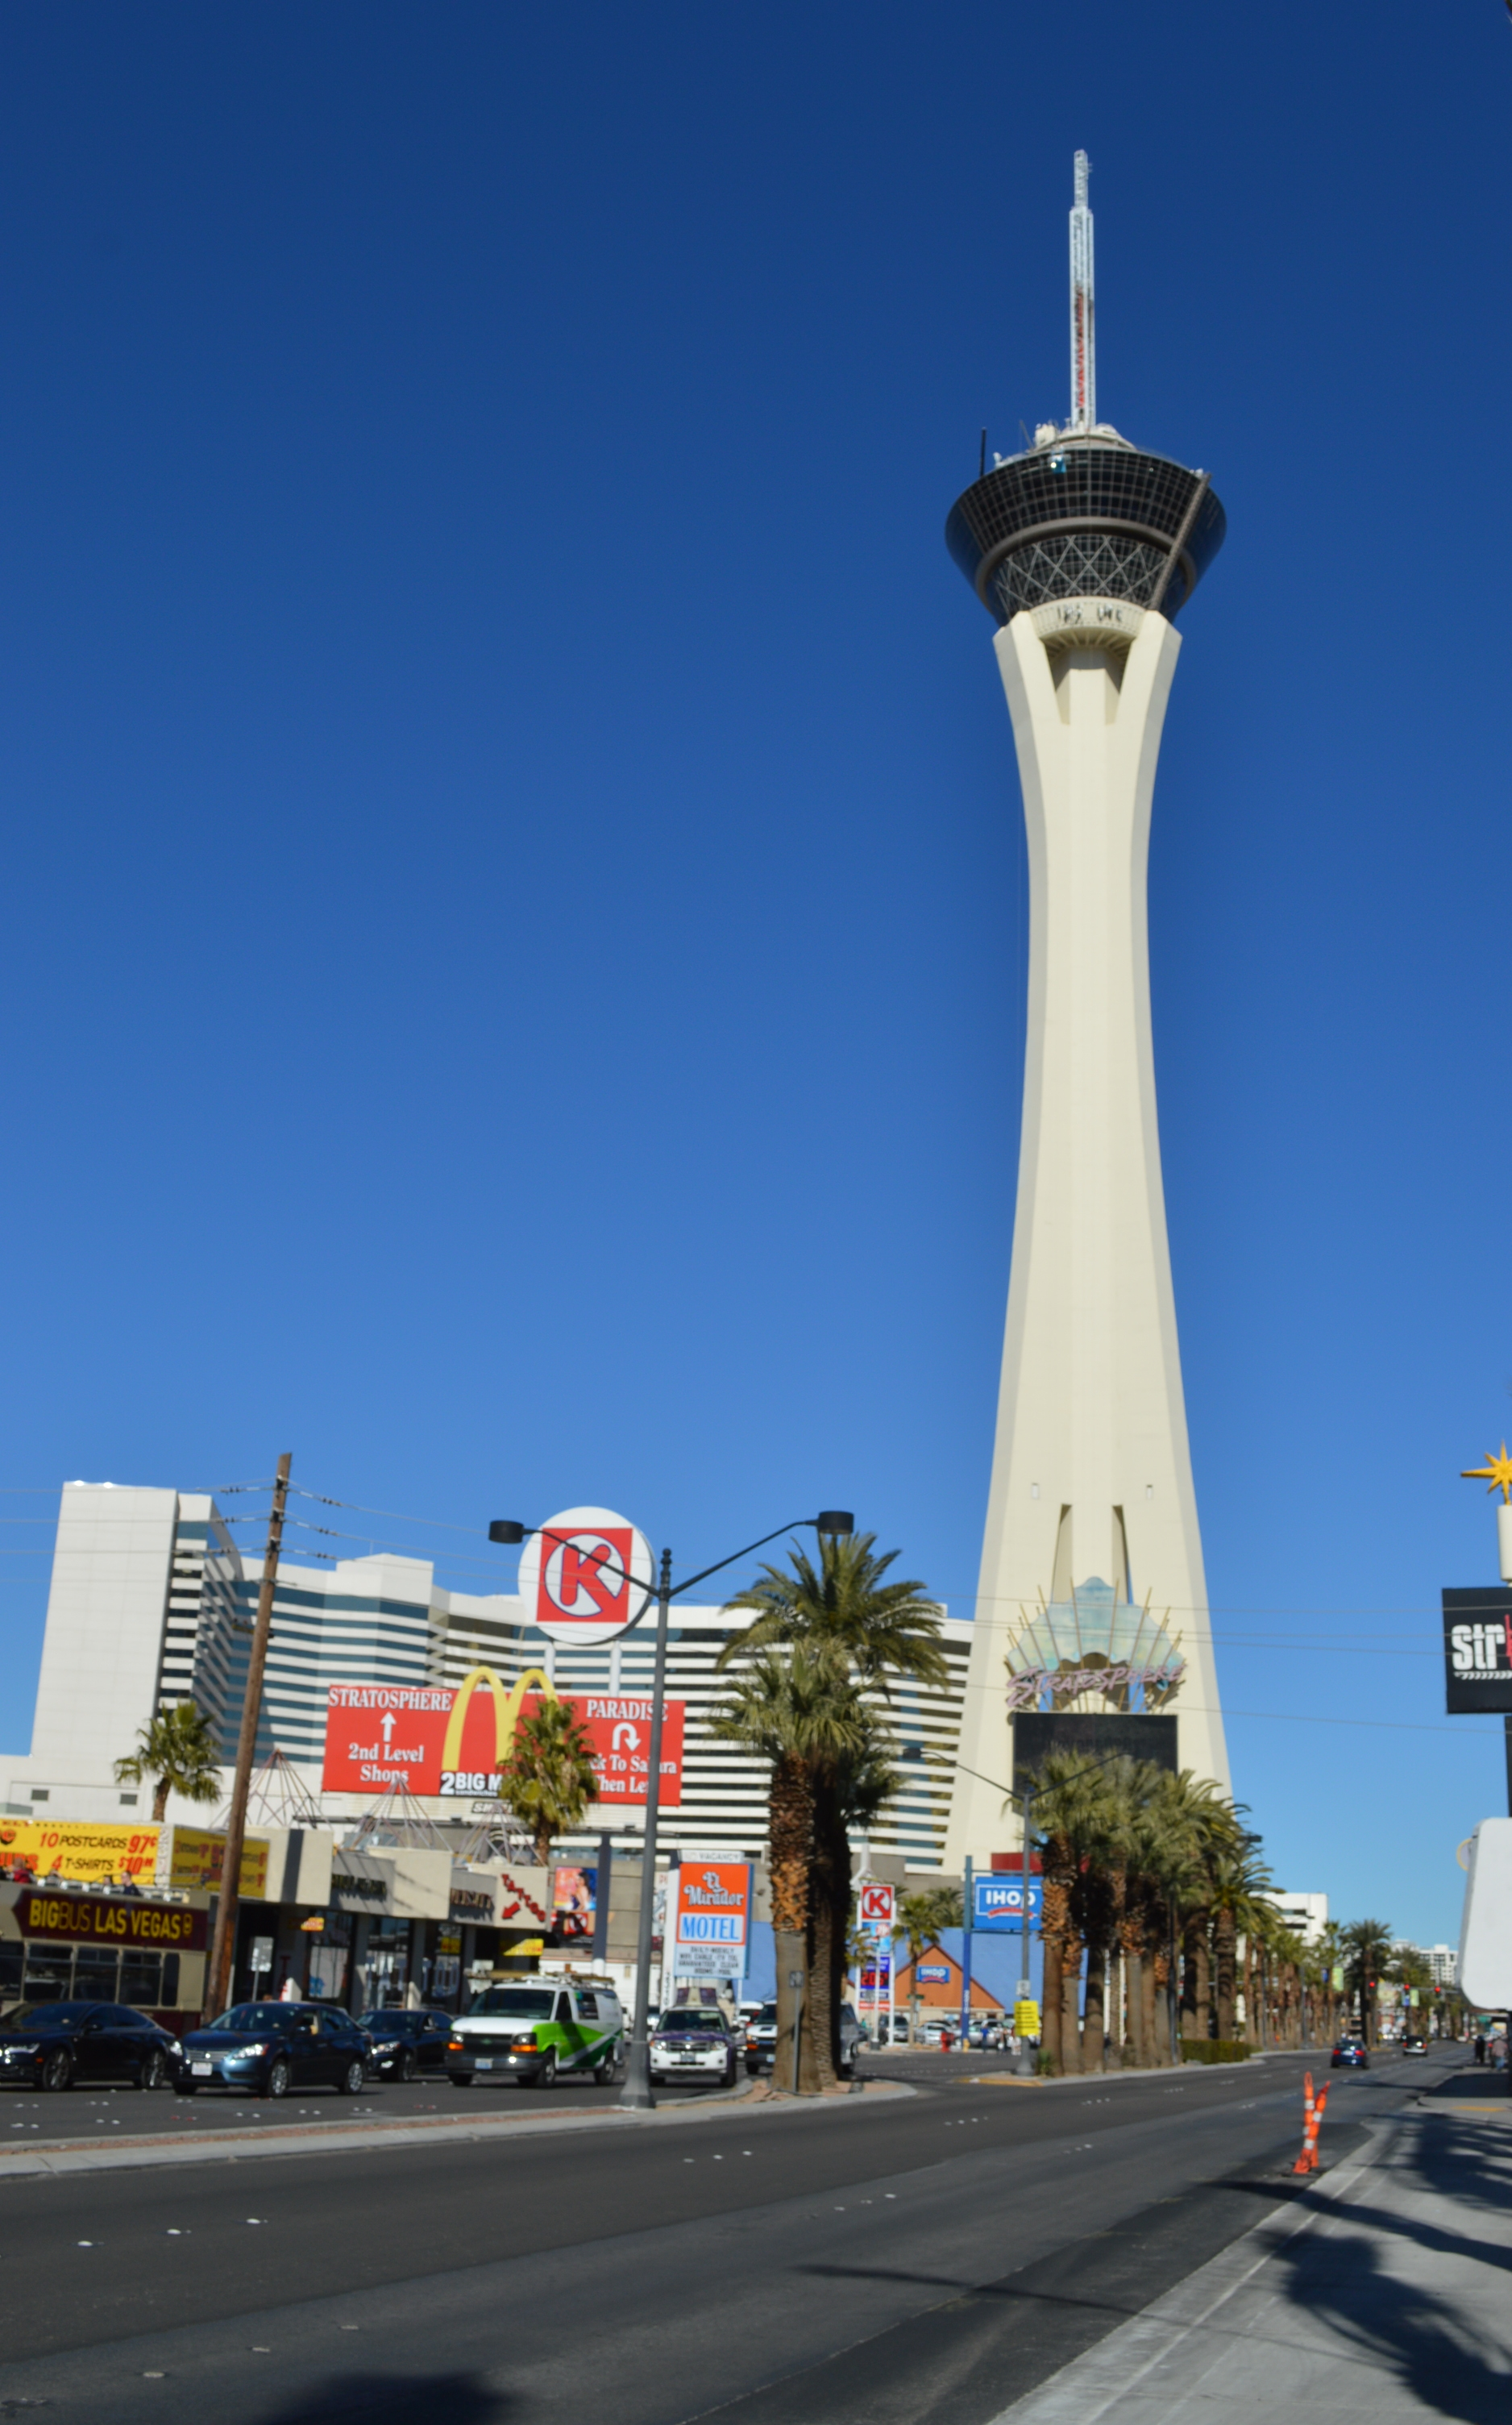 Stratosphere Tower ストラトスフィアタワー展望台